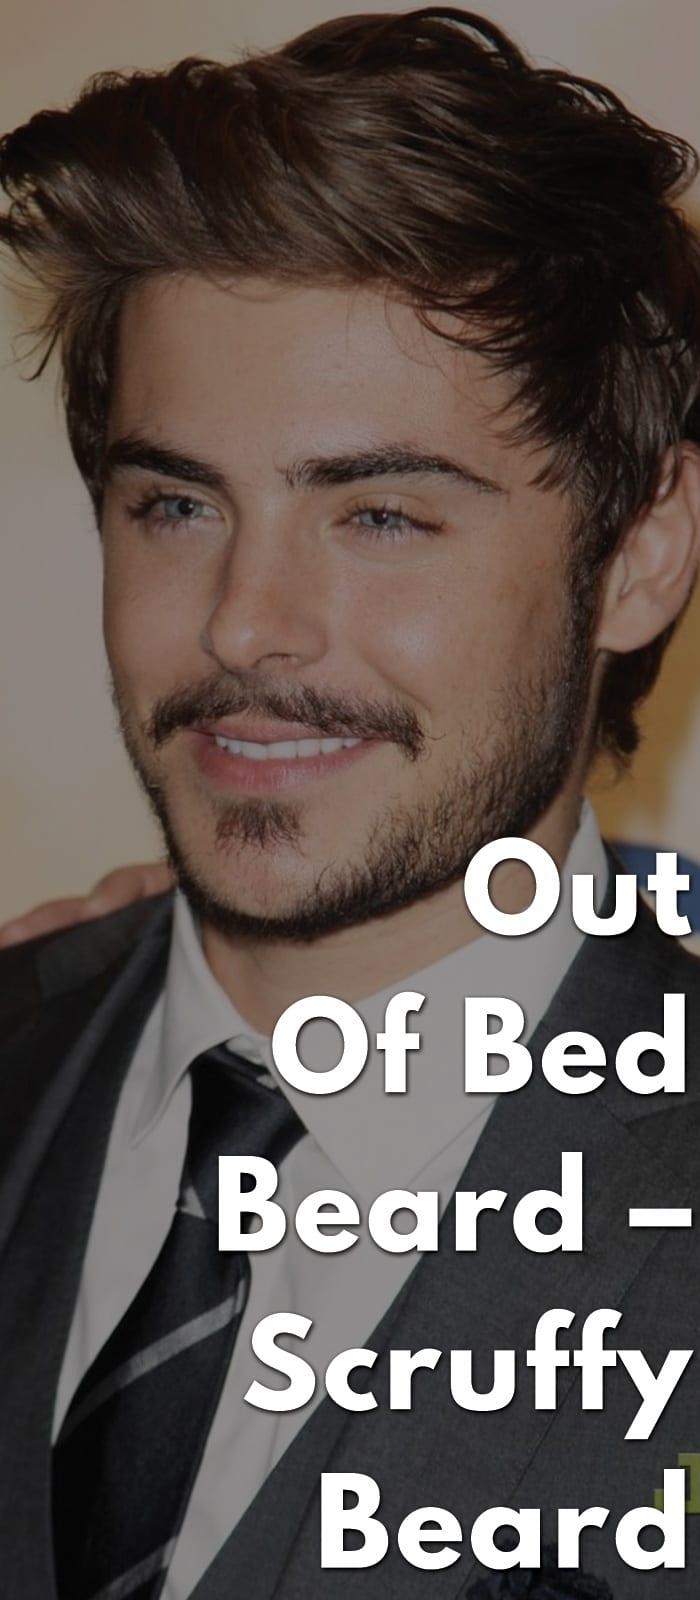 Out-of-Bed-Beard-–-Scruffy-Beard.